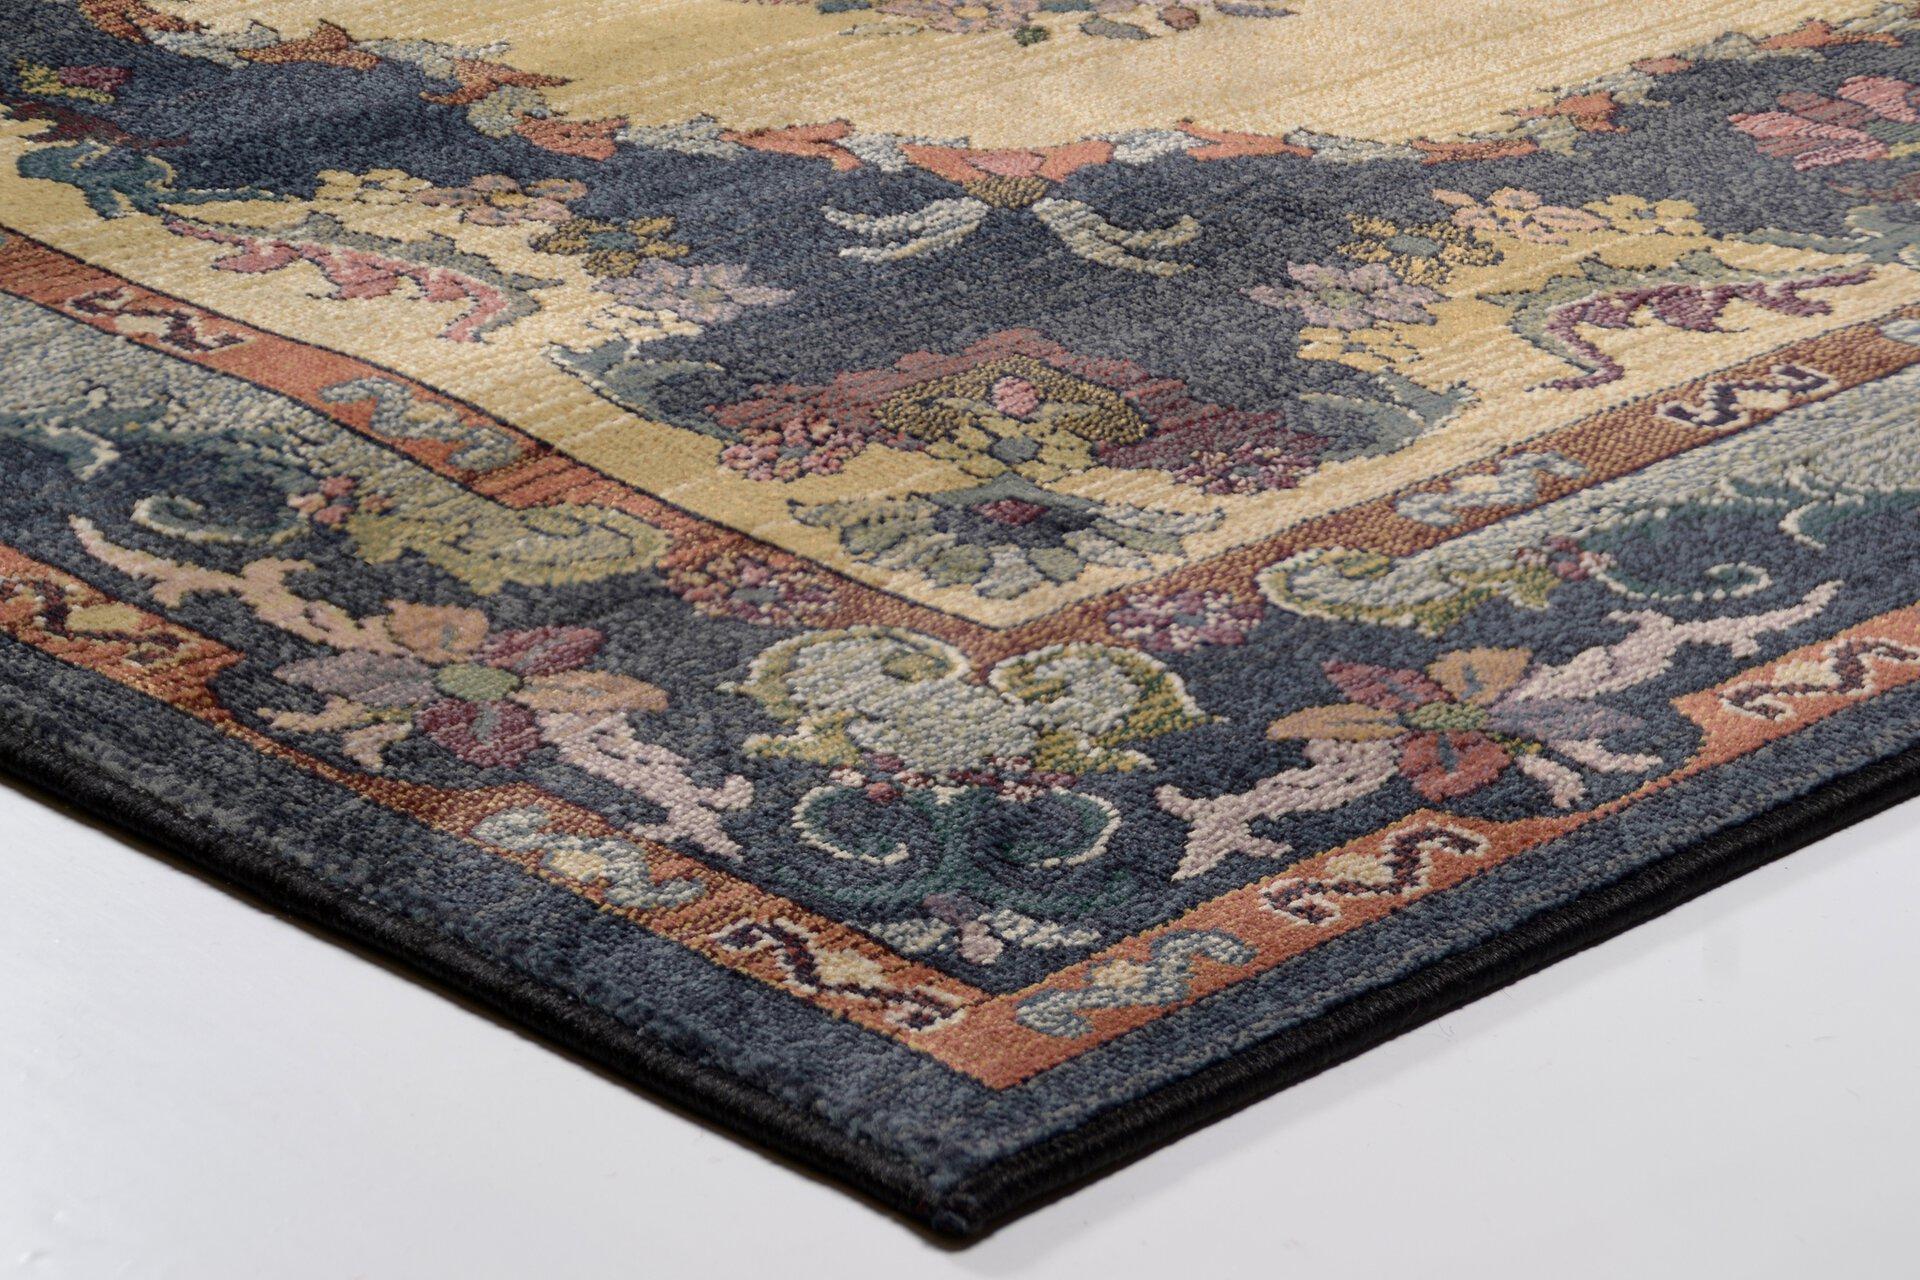 Maschinenwebteppich Gabiro Theko Textil Blau 200 x 285 cm